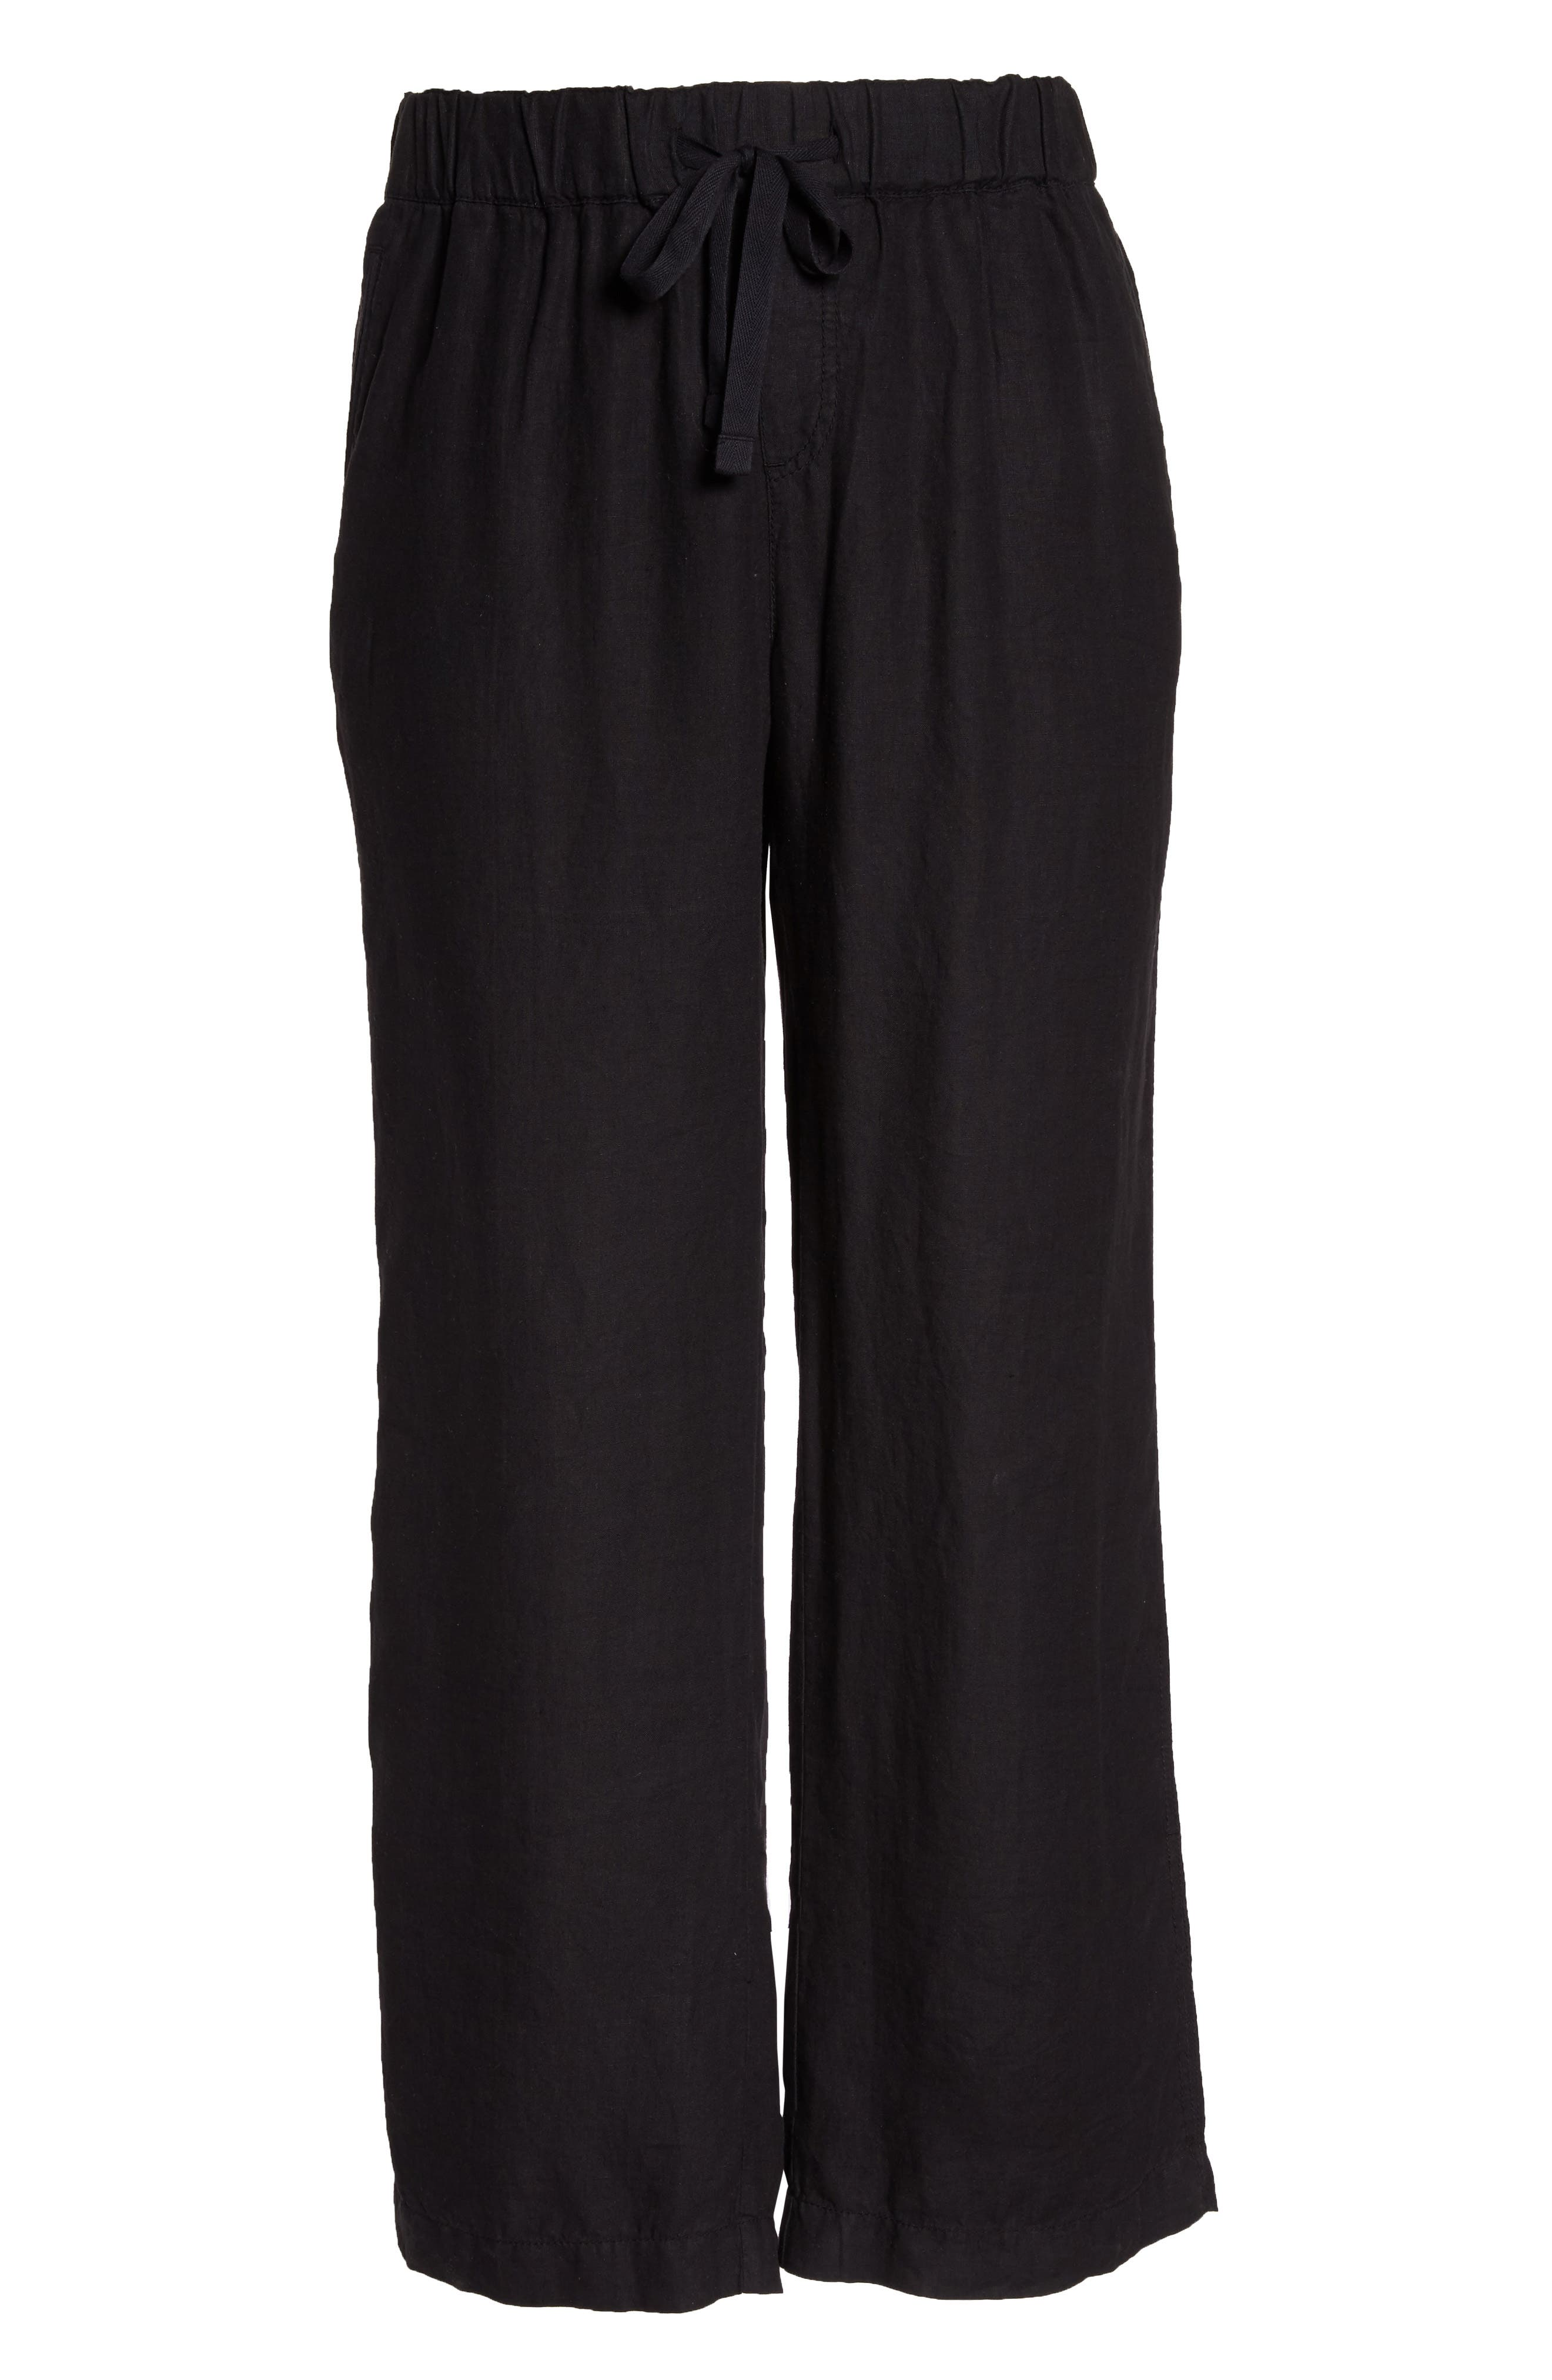 Linen Track Pants,                             Alternate thumbnail 6, color,                             001